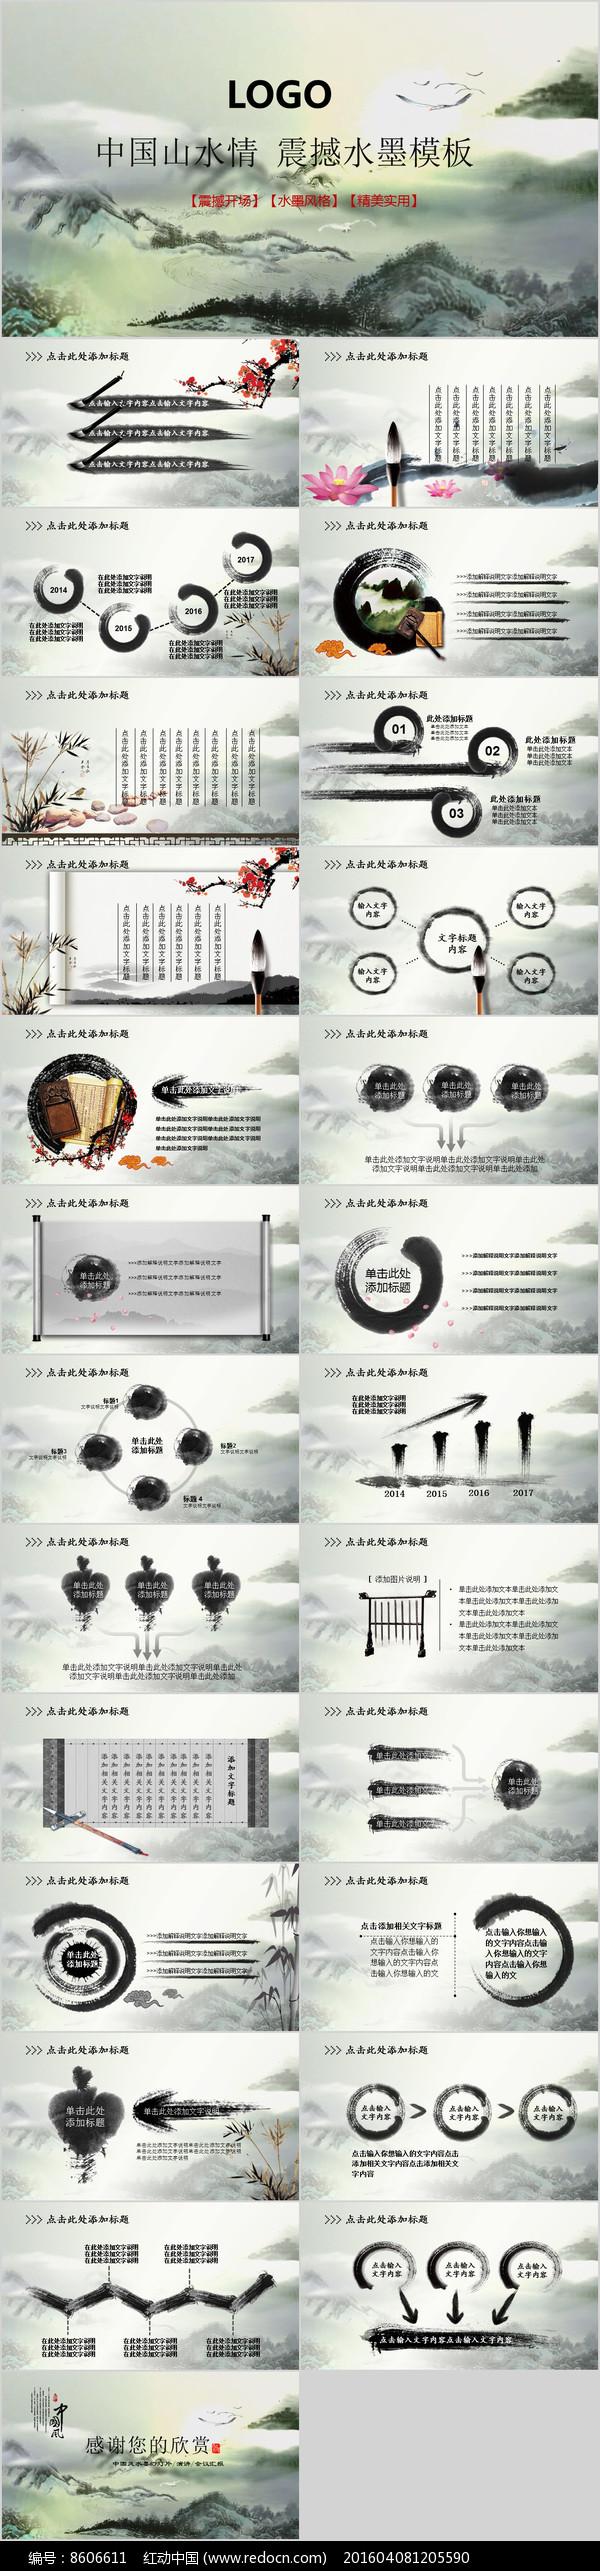 AE水墨中国风总结汇报PPT图片